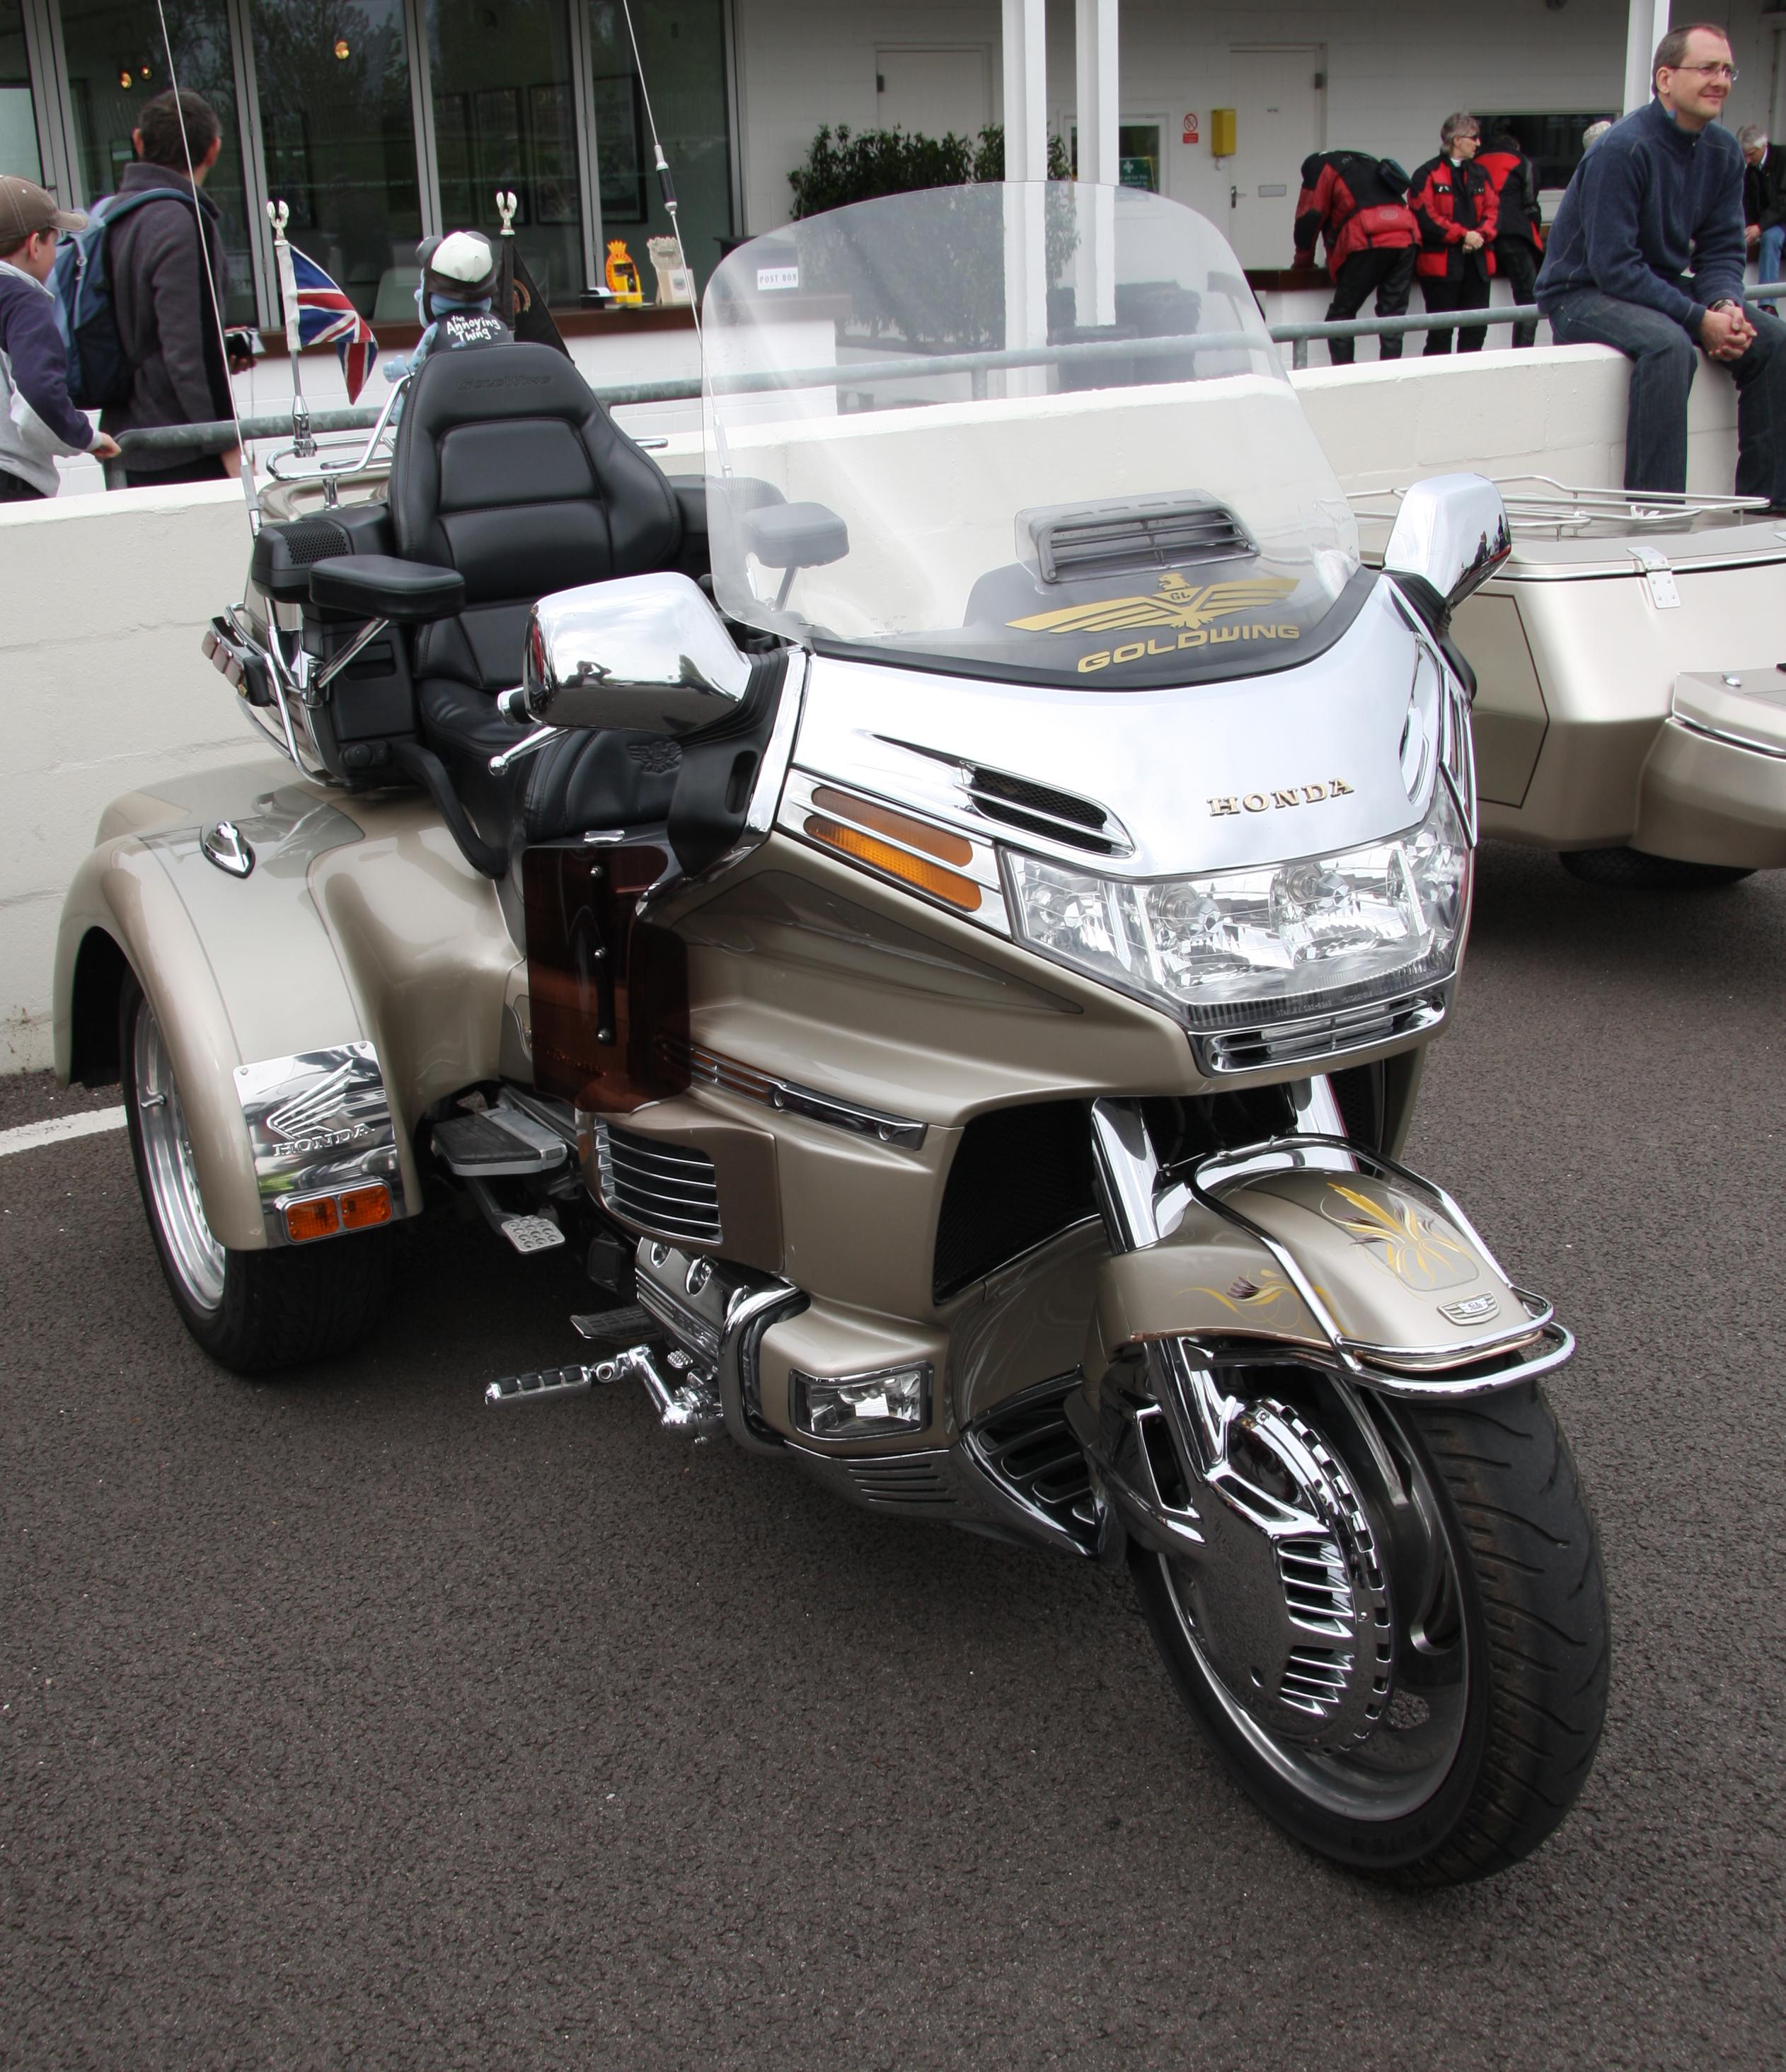 Honda Goldwing Motorcycles Ebay